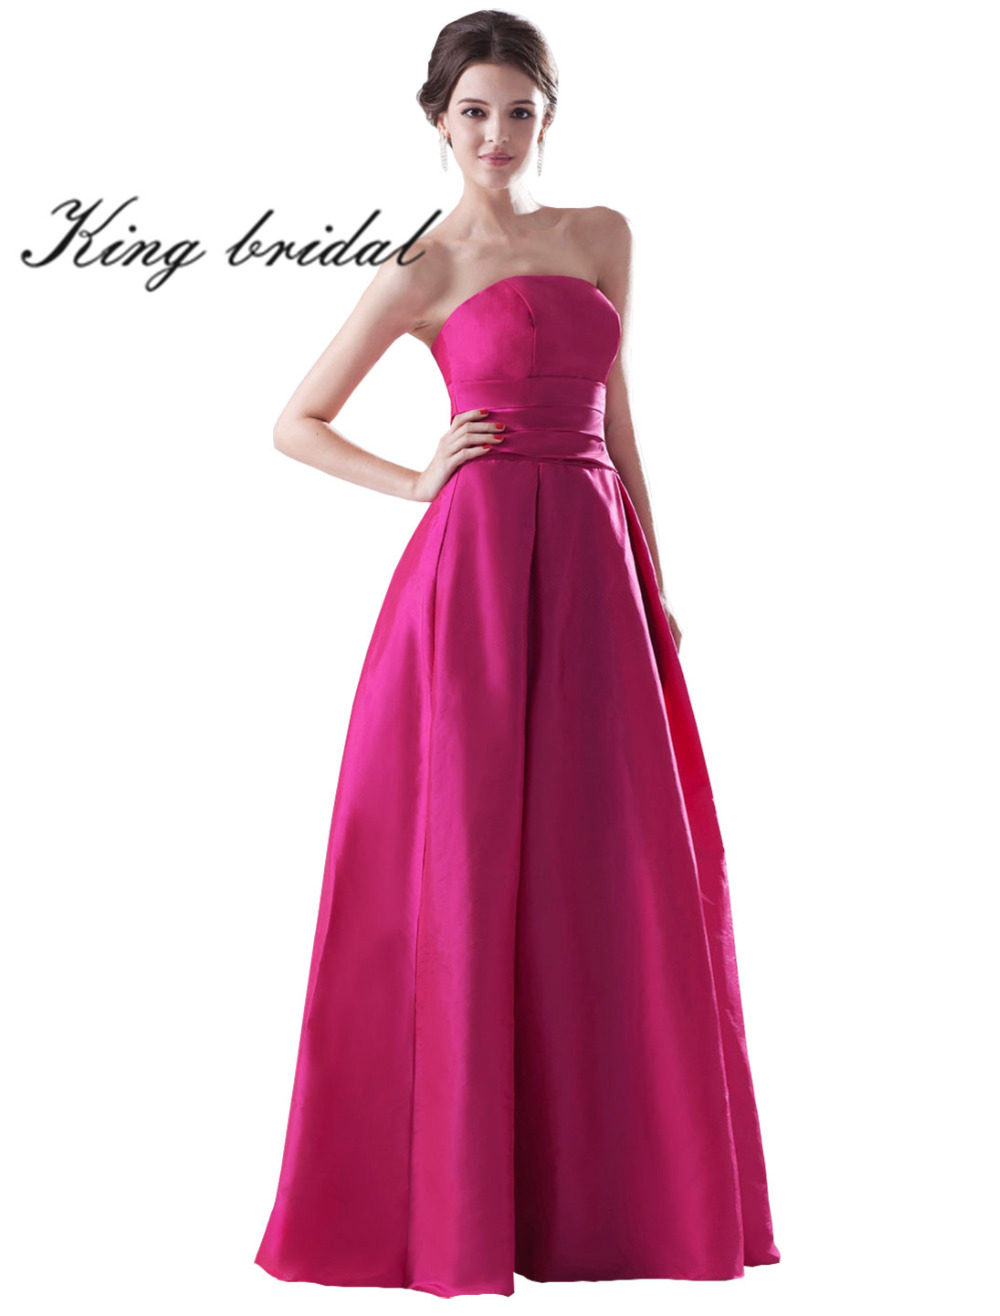 Lujoso Vestido De Fiesta Sin Tirantes Púrpura Patrón - Colección de ...